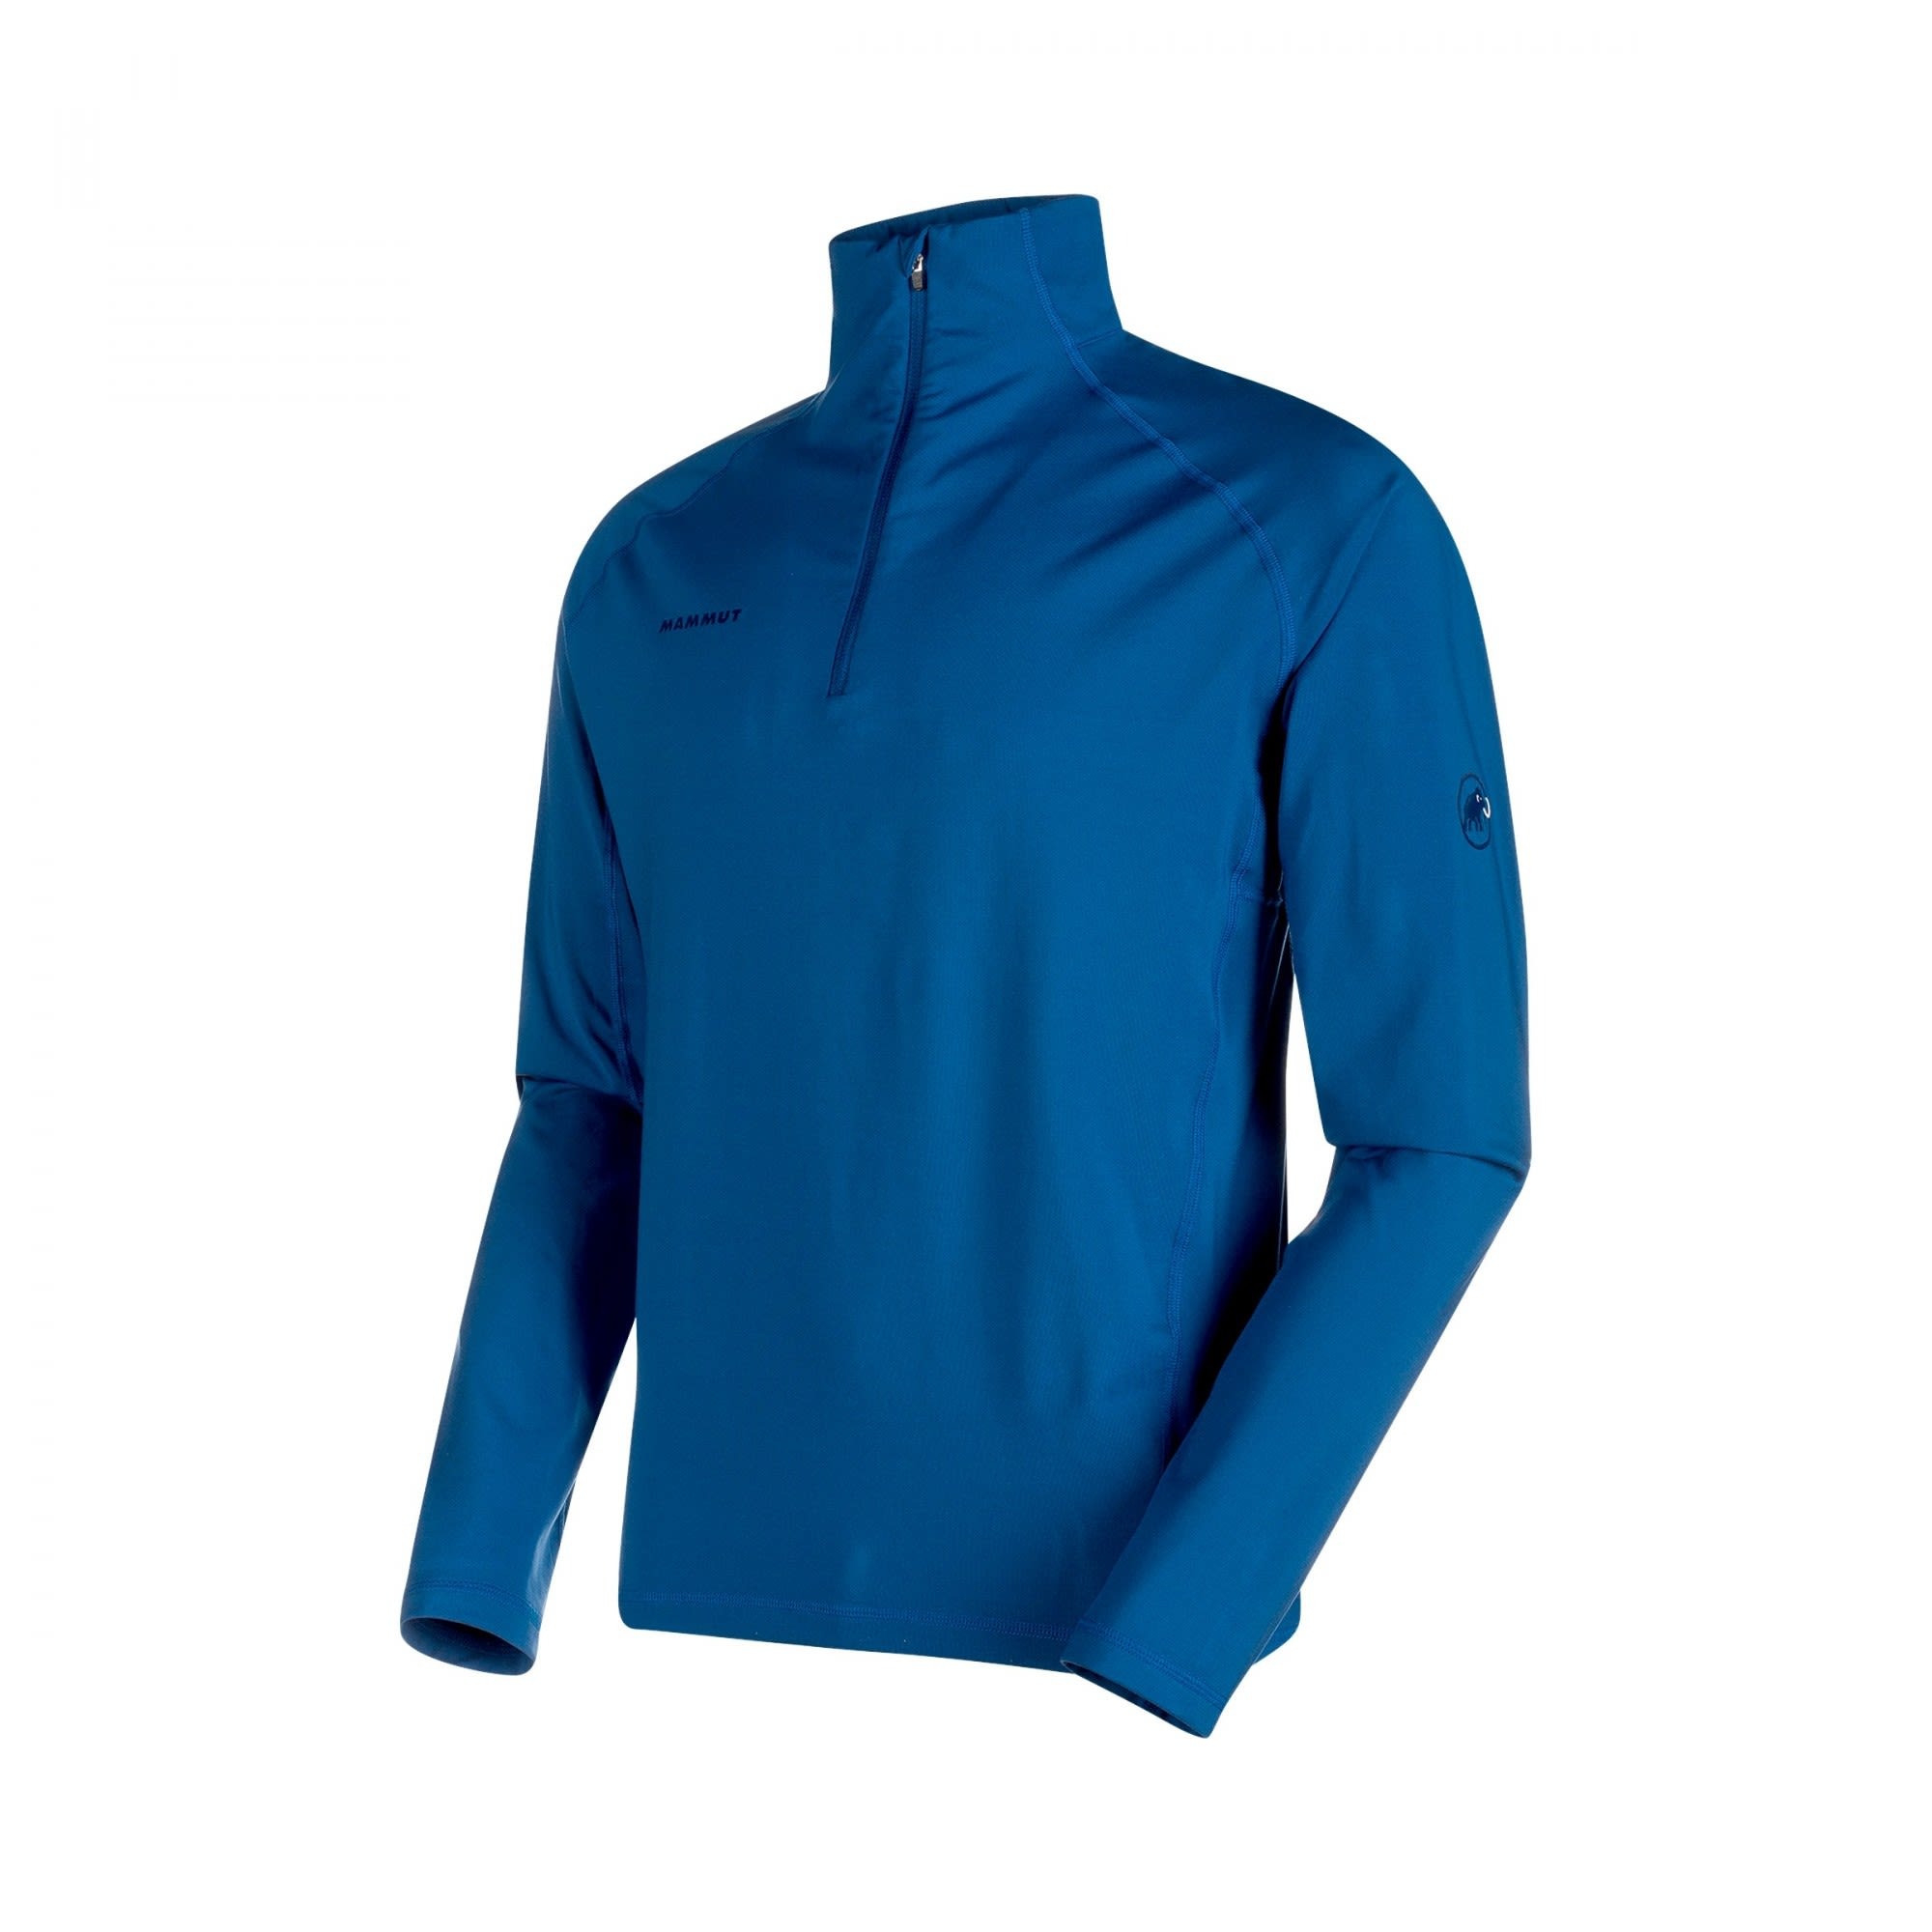 Mammut Snow ML Half Zip Pull Blau, Male Langarm-Shirt, L